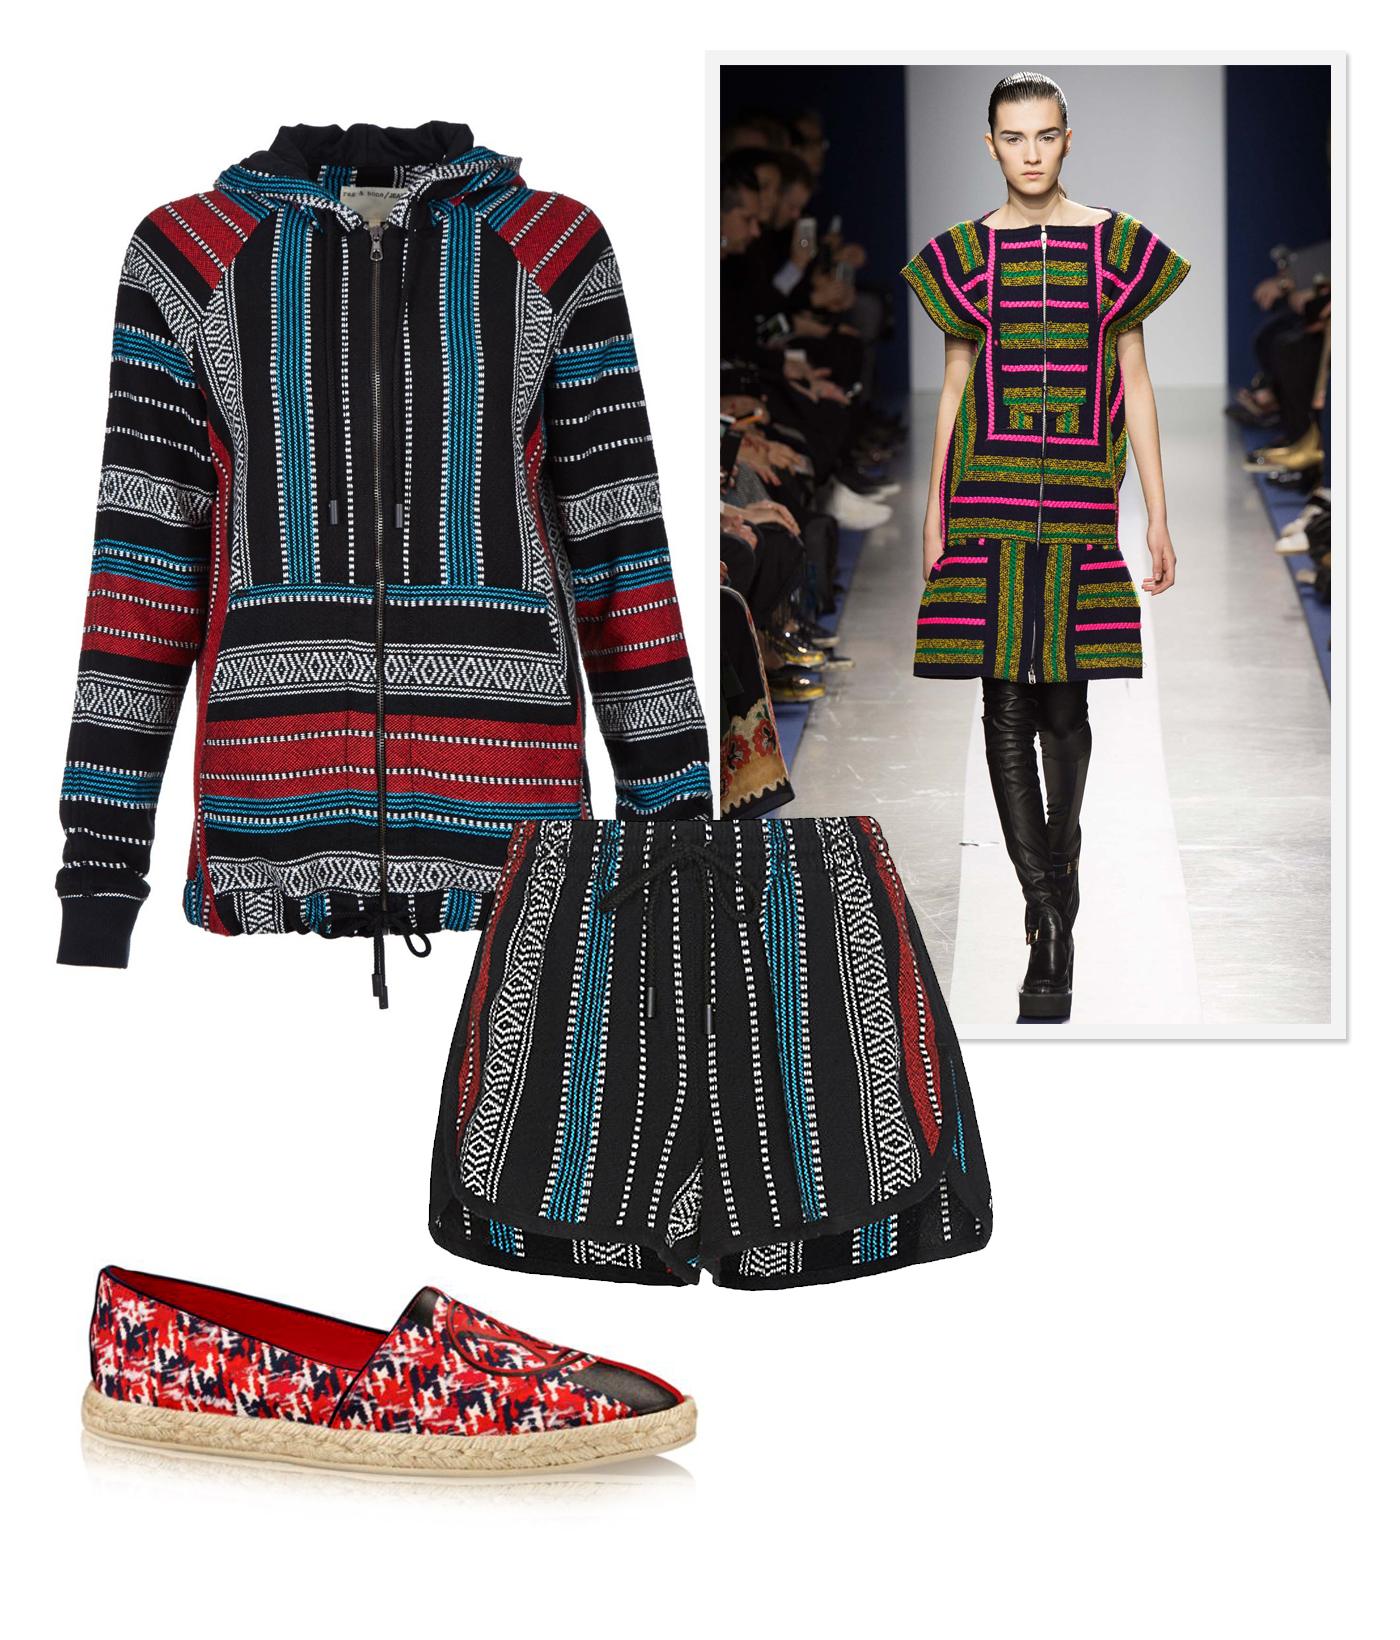 fall-2015-trends-shopping-10.jpg